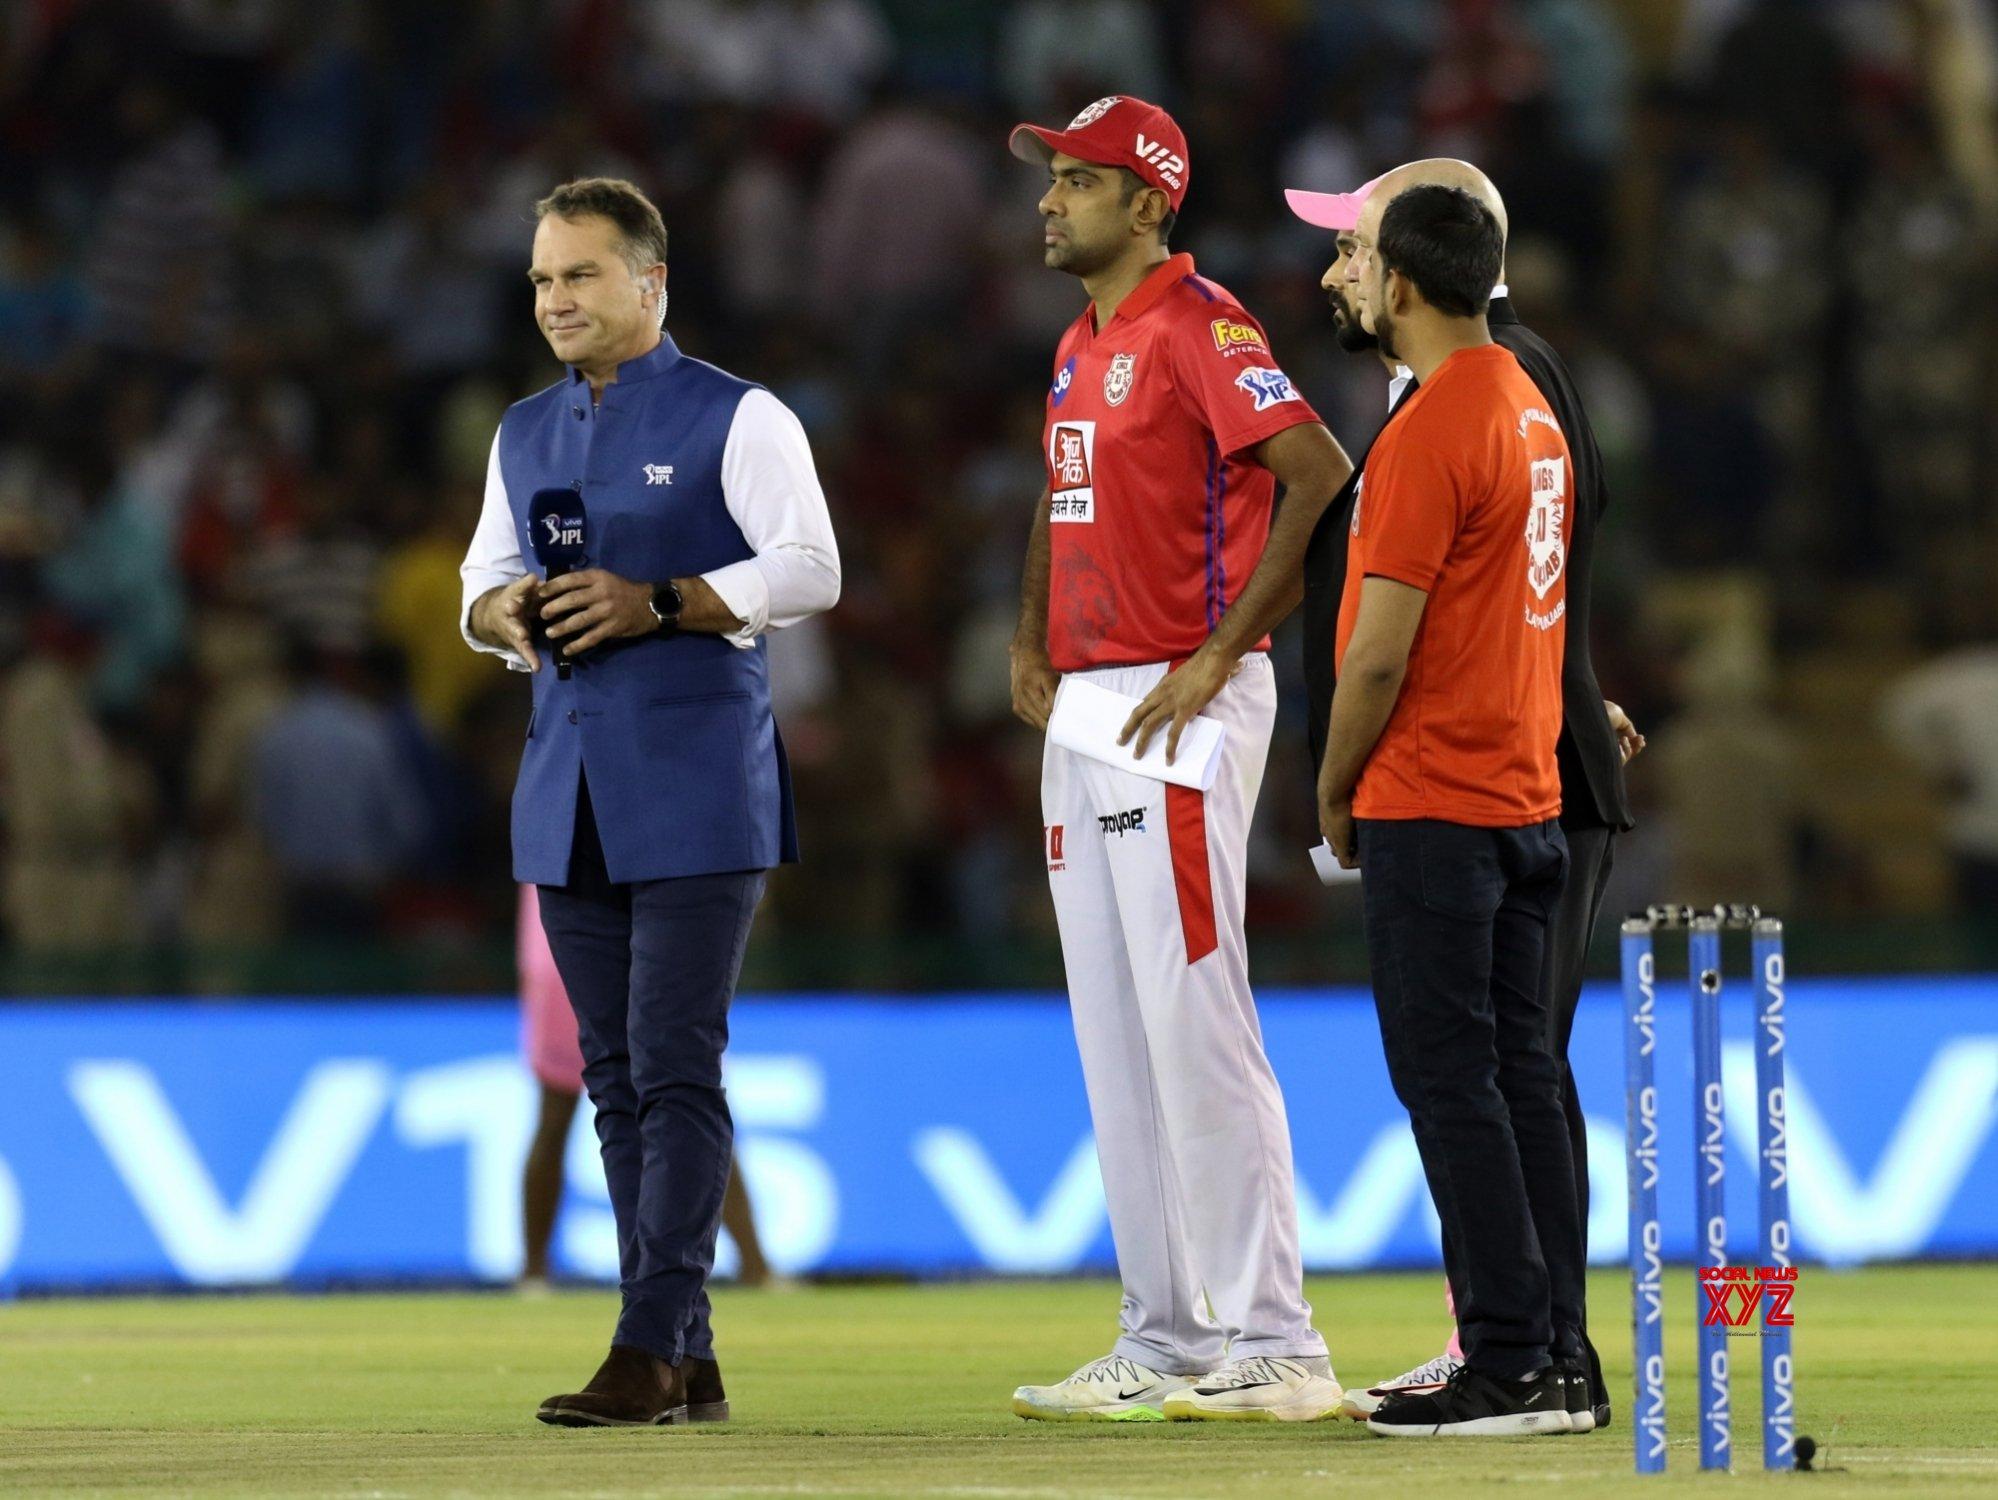 Mohali: IPL 2019 - Match 32 - Kings XI Punjab Vs Rajasthan Royals (Batch - 1) #Gallery